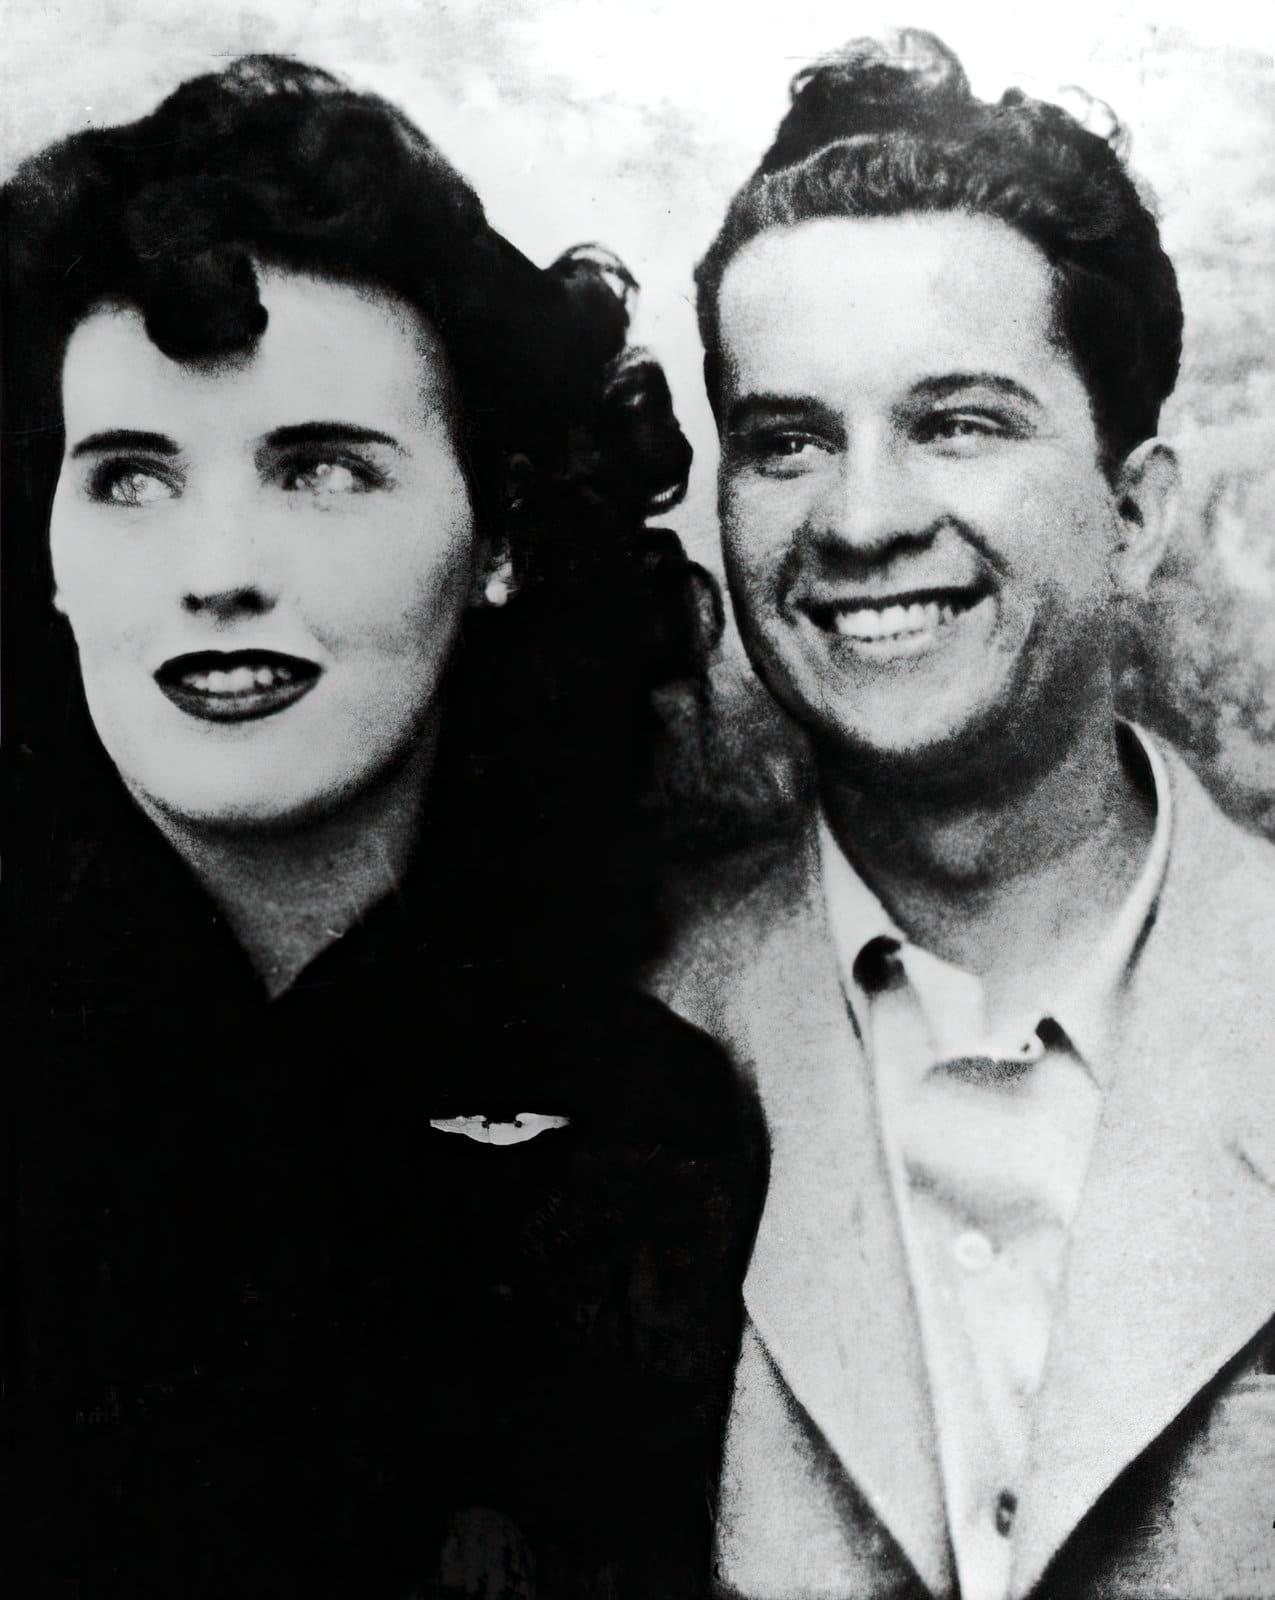 Black Dahlia photo with a friend